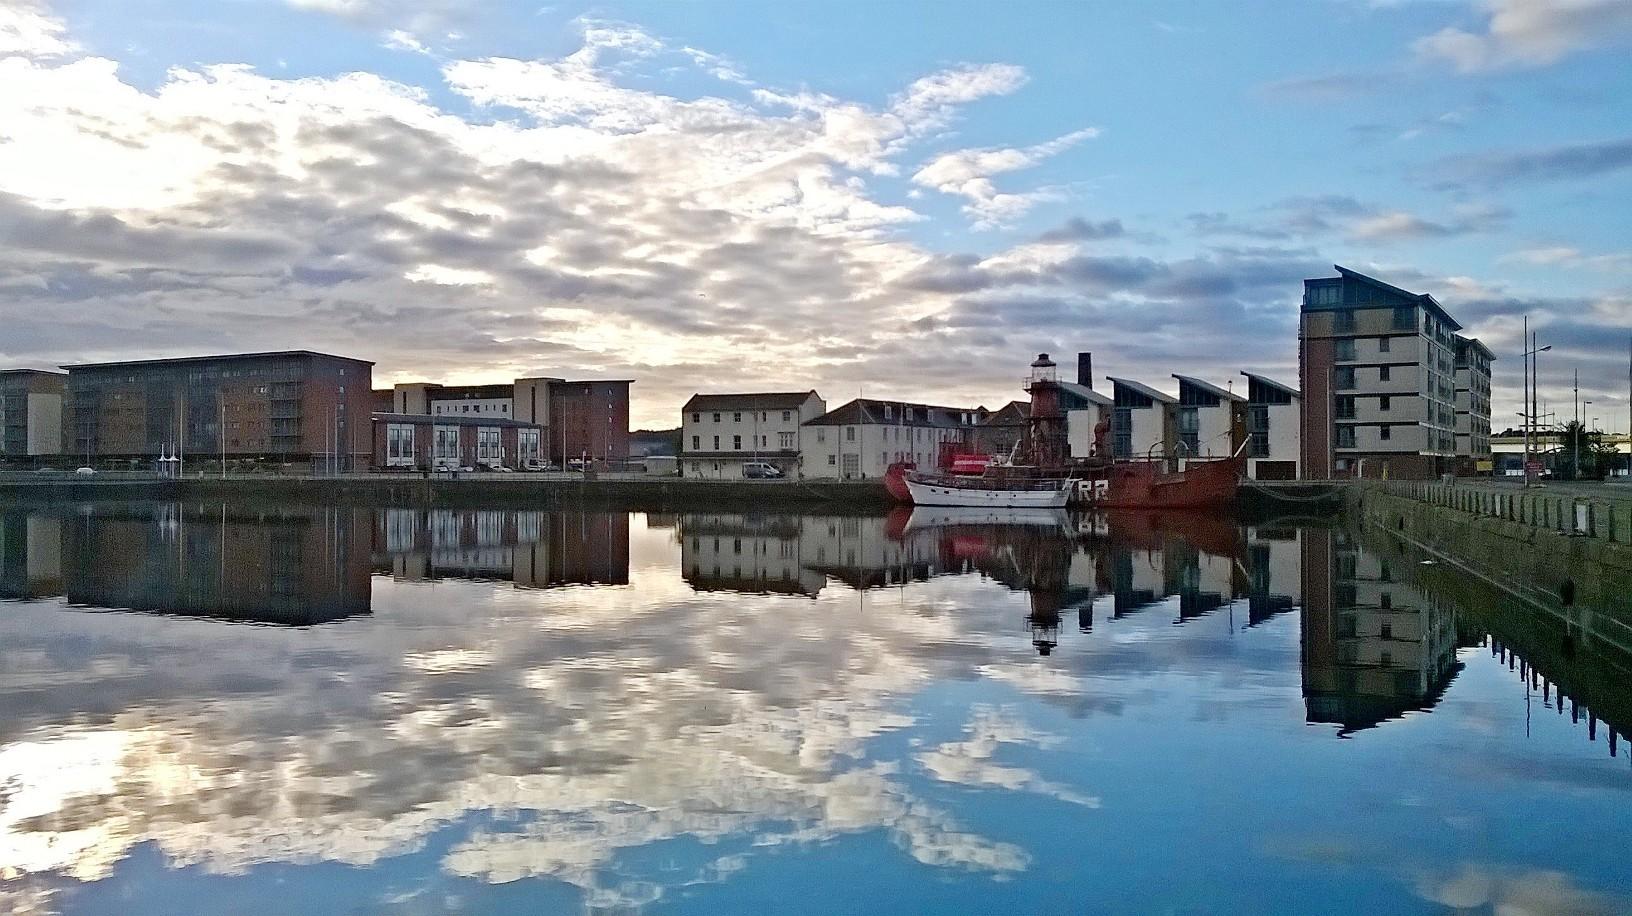 City Quay (stock image)